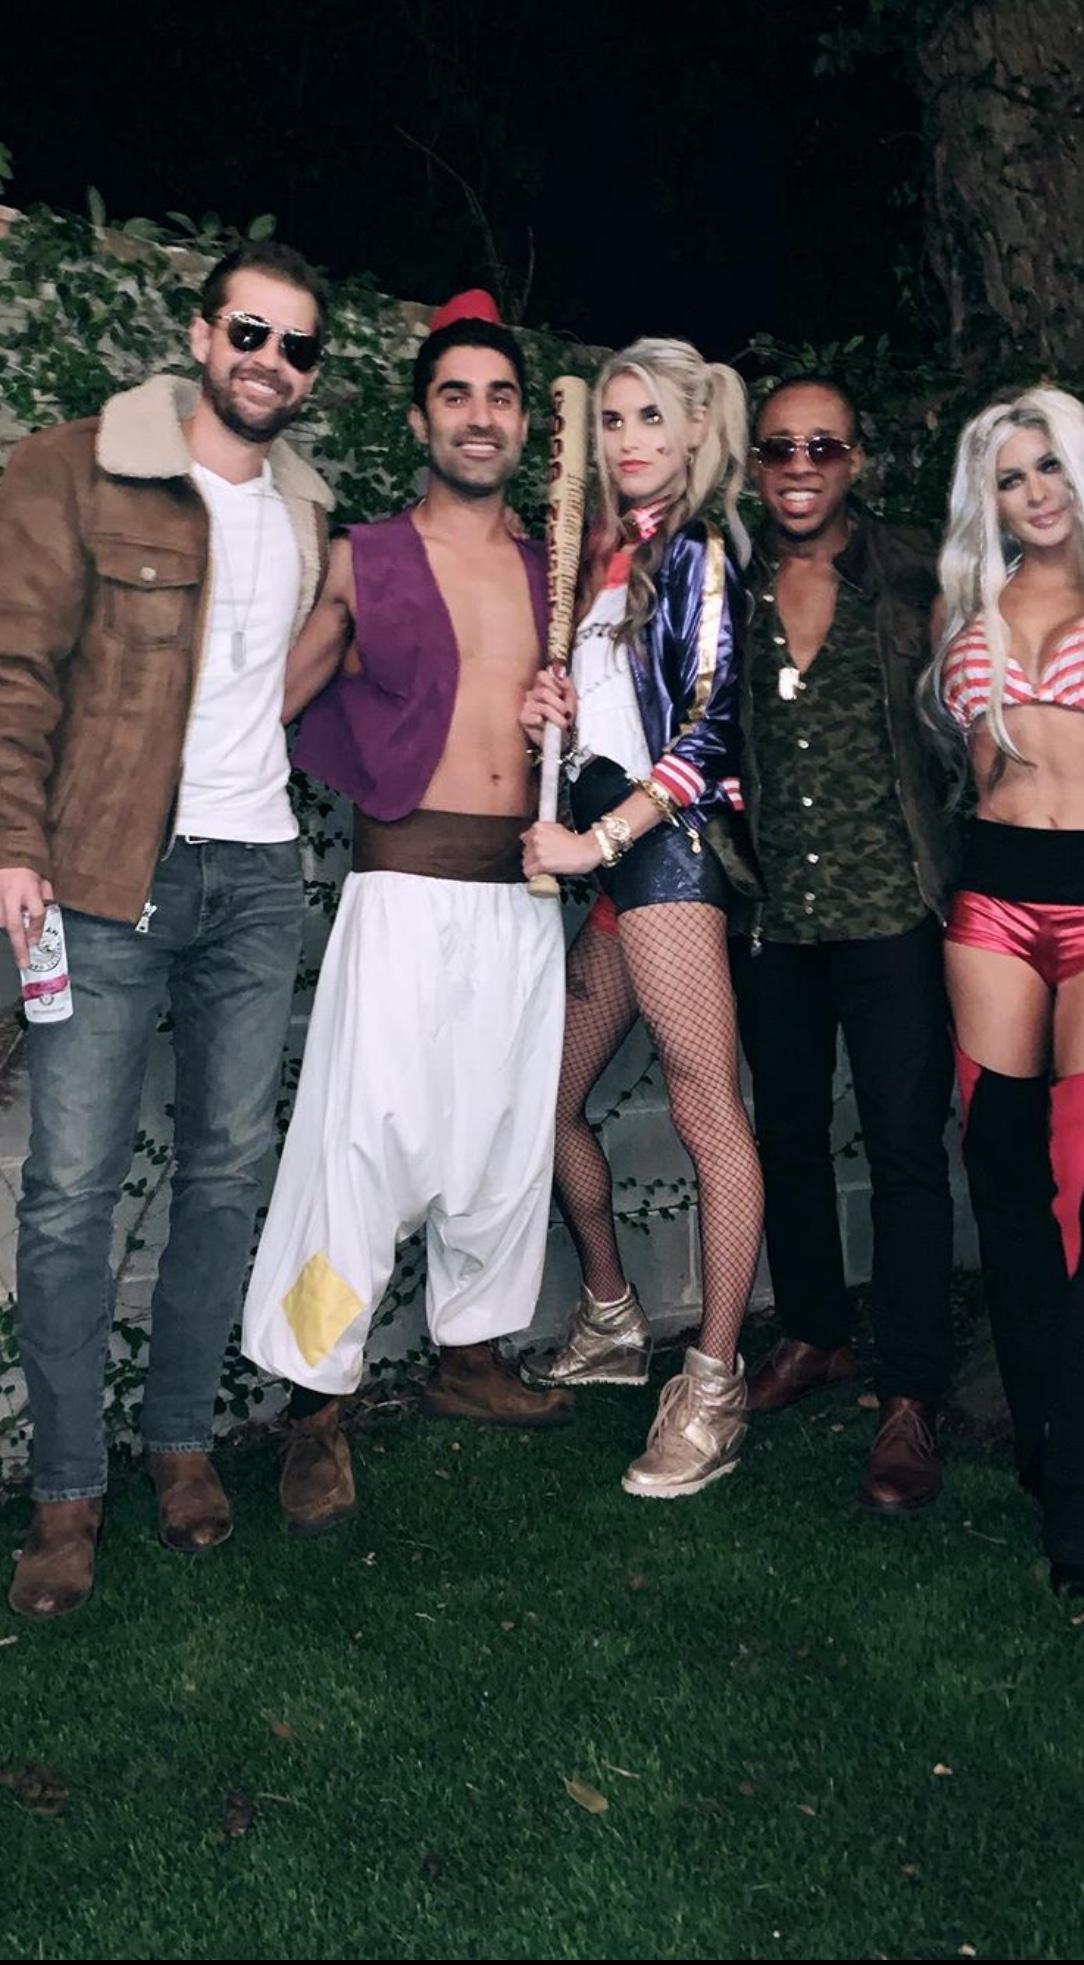 2nd Annual Halloween Party Dannon Like The Yogurt Charleston Costume 2018